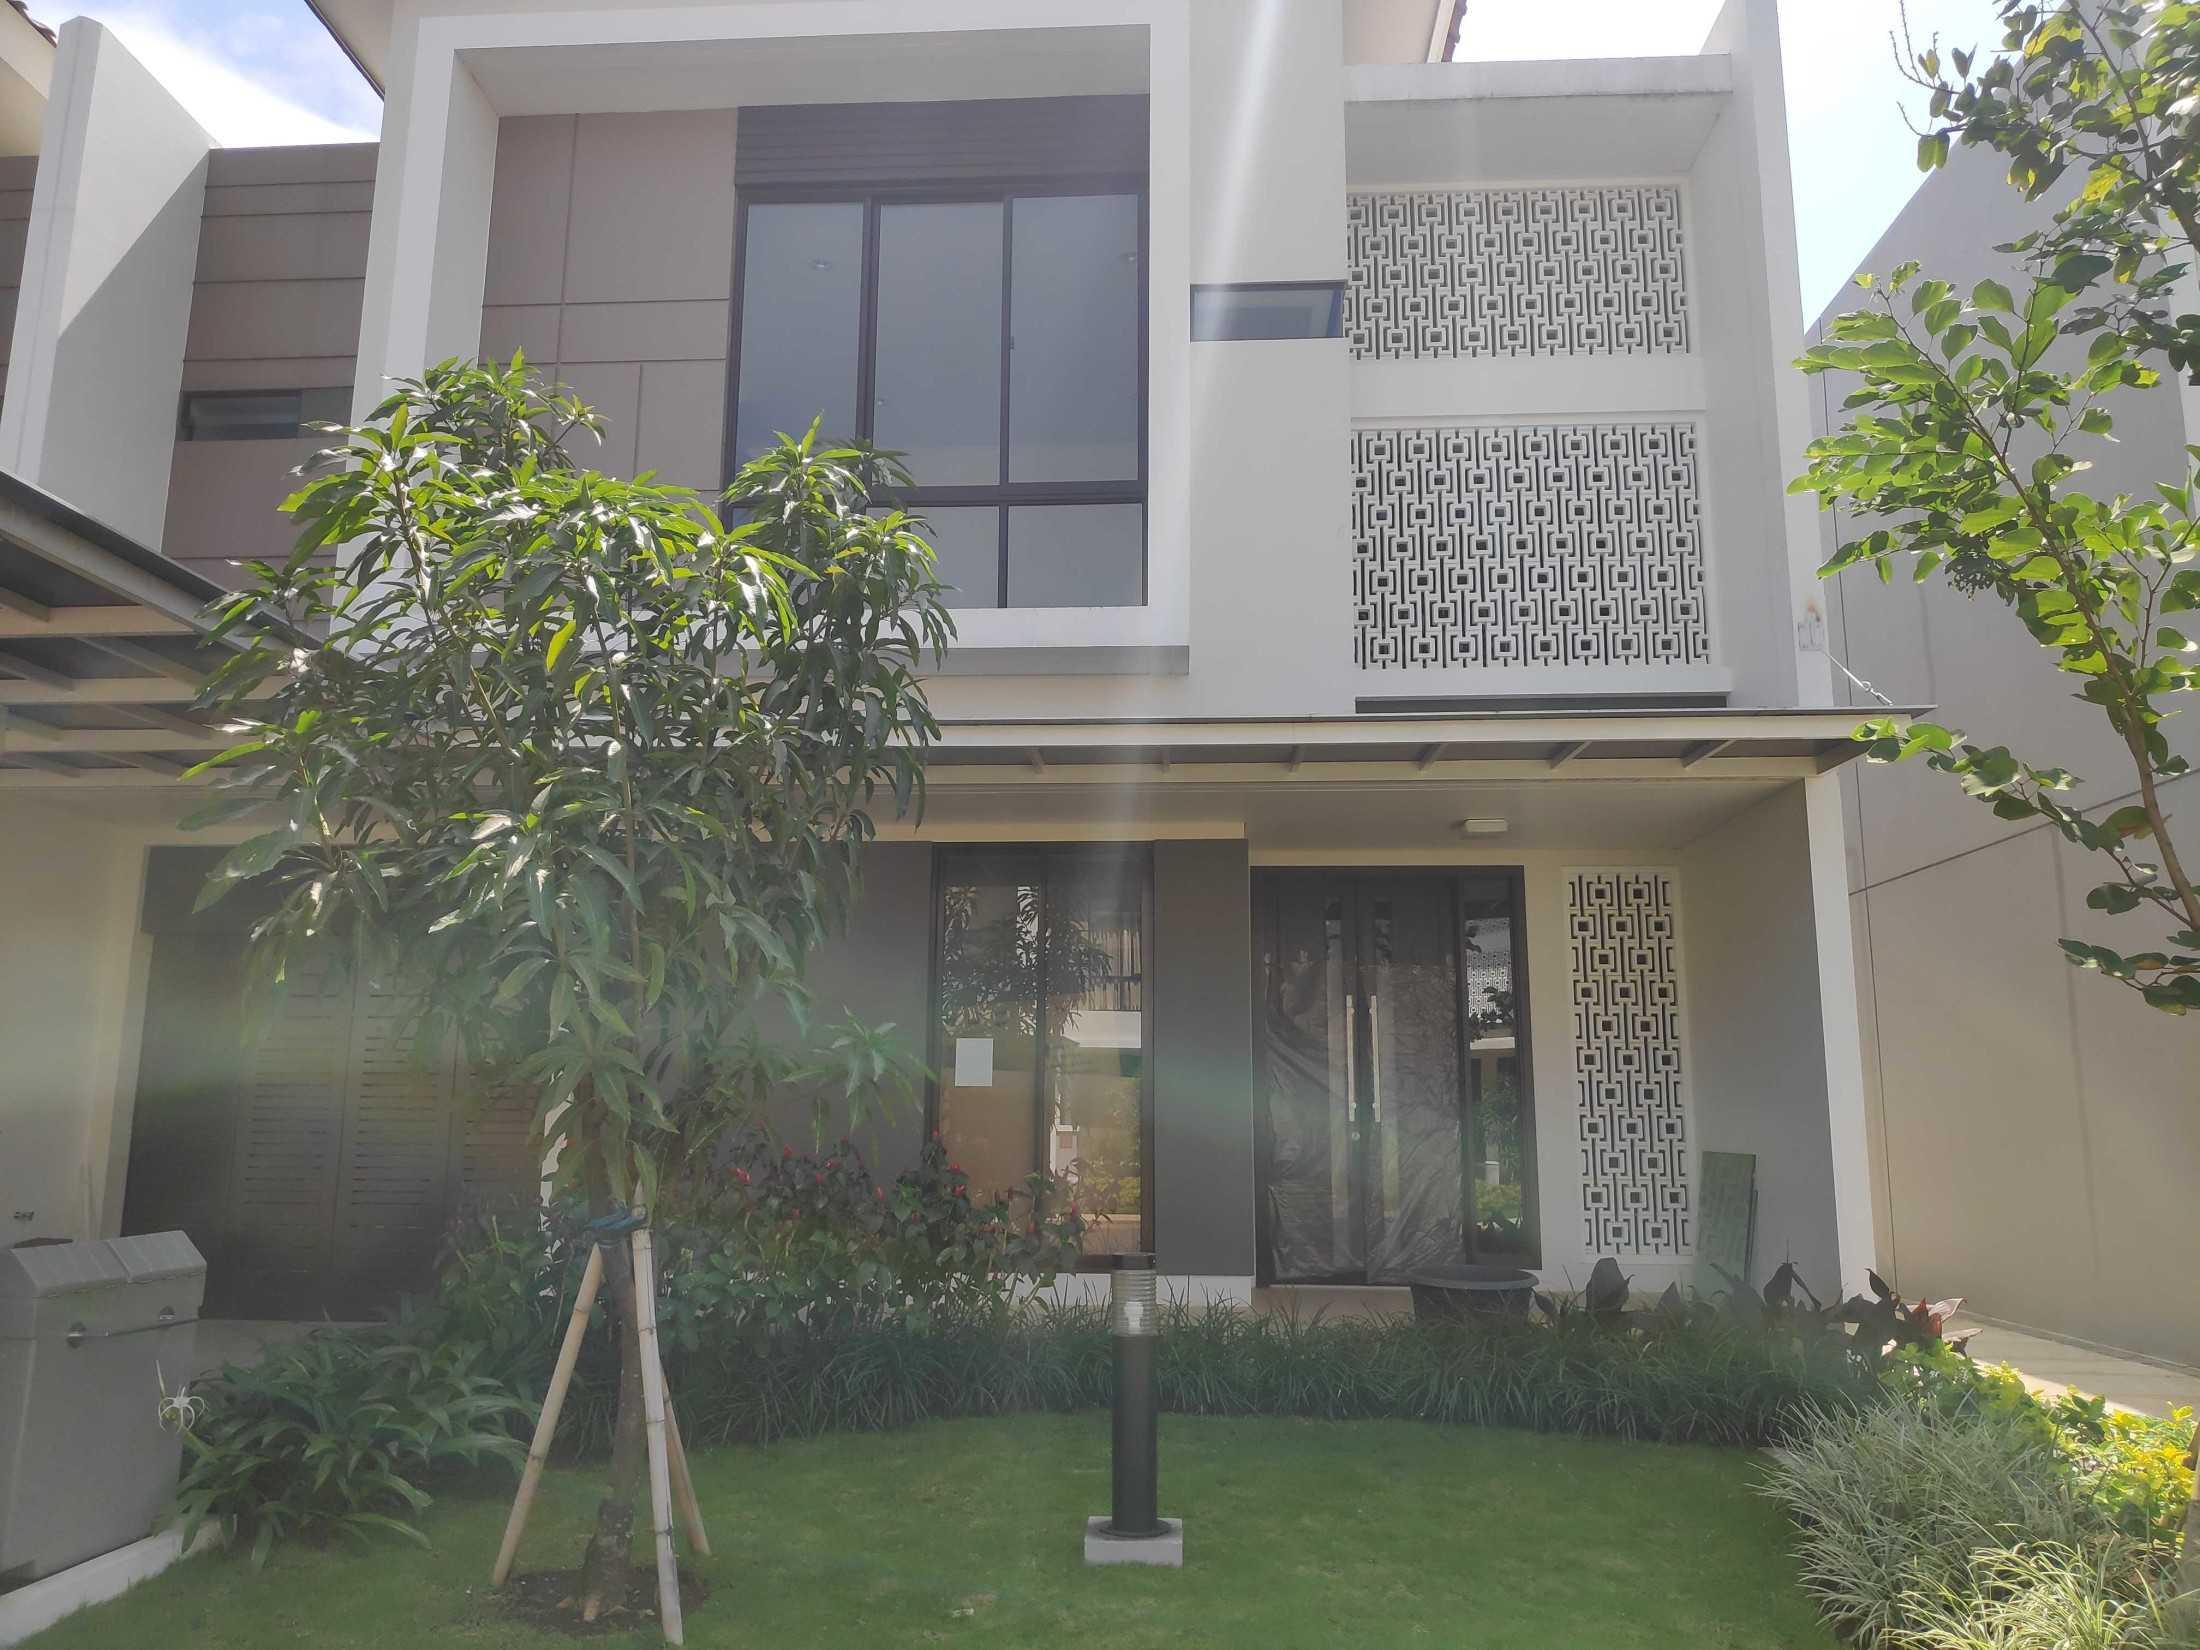 Purnama Adiprana B-House Bandung, Kota Bandung, Jawa Barat, Indonesia Bandung, Kota Bandung, Jawa Barat, Indonesia Purnama-Adiprana-B-House Minimalist 90321